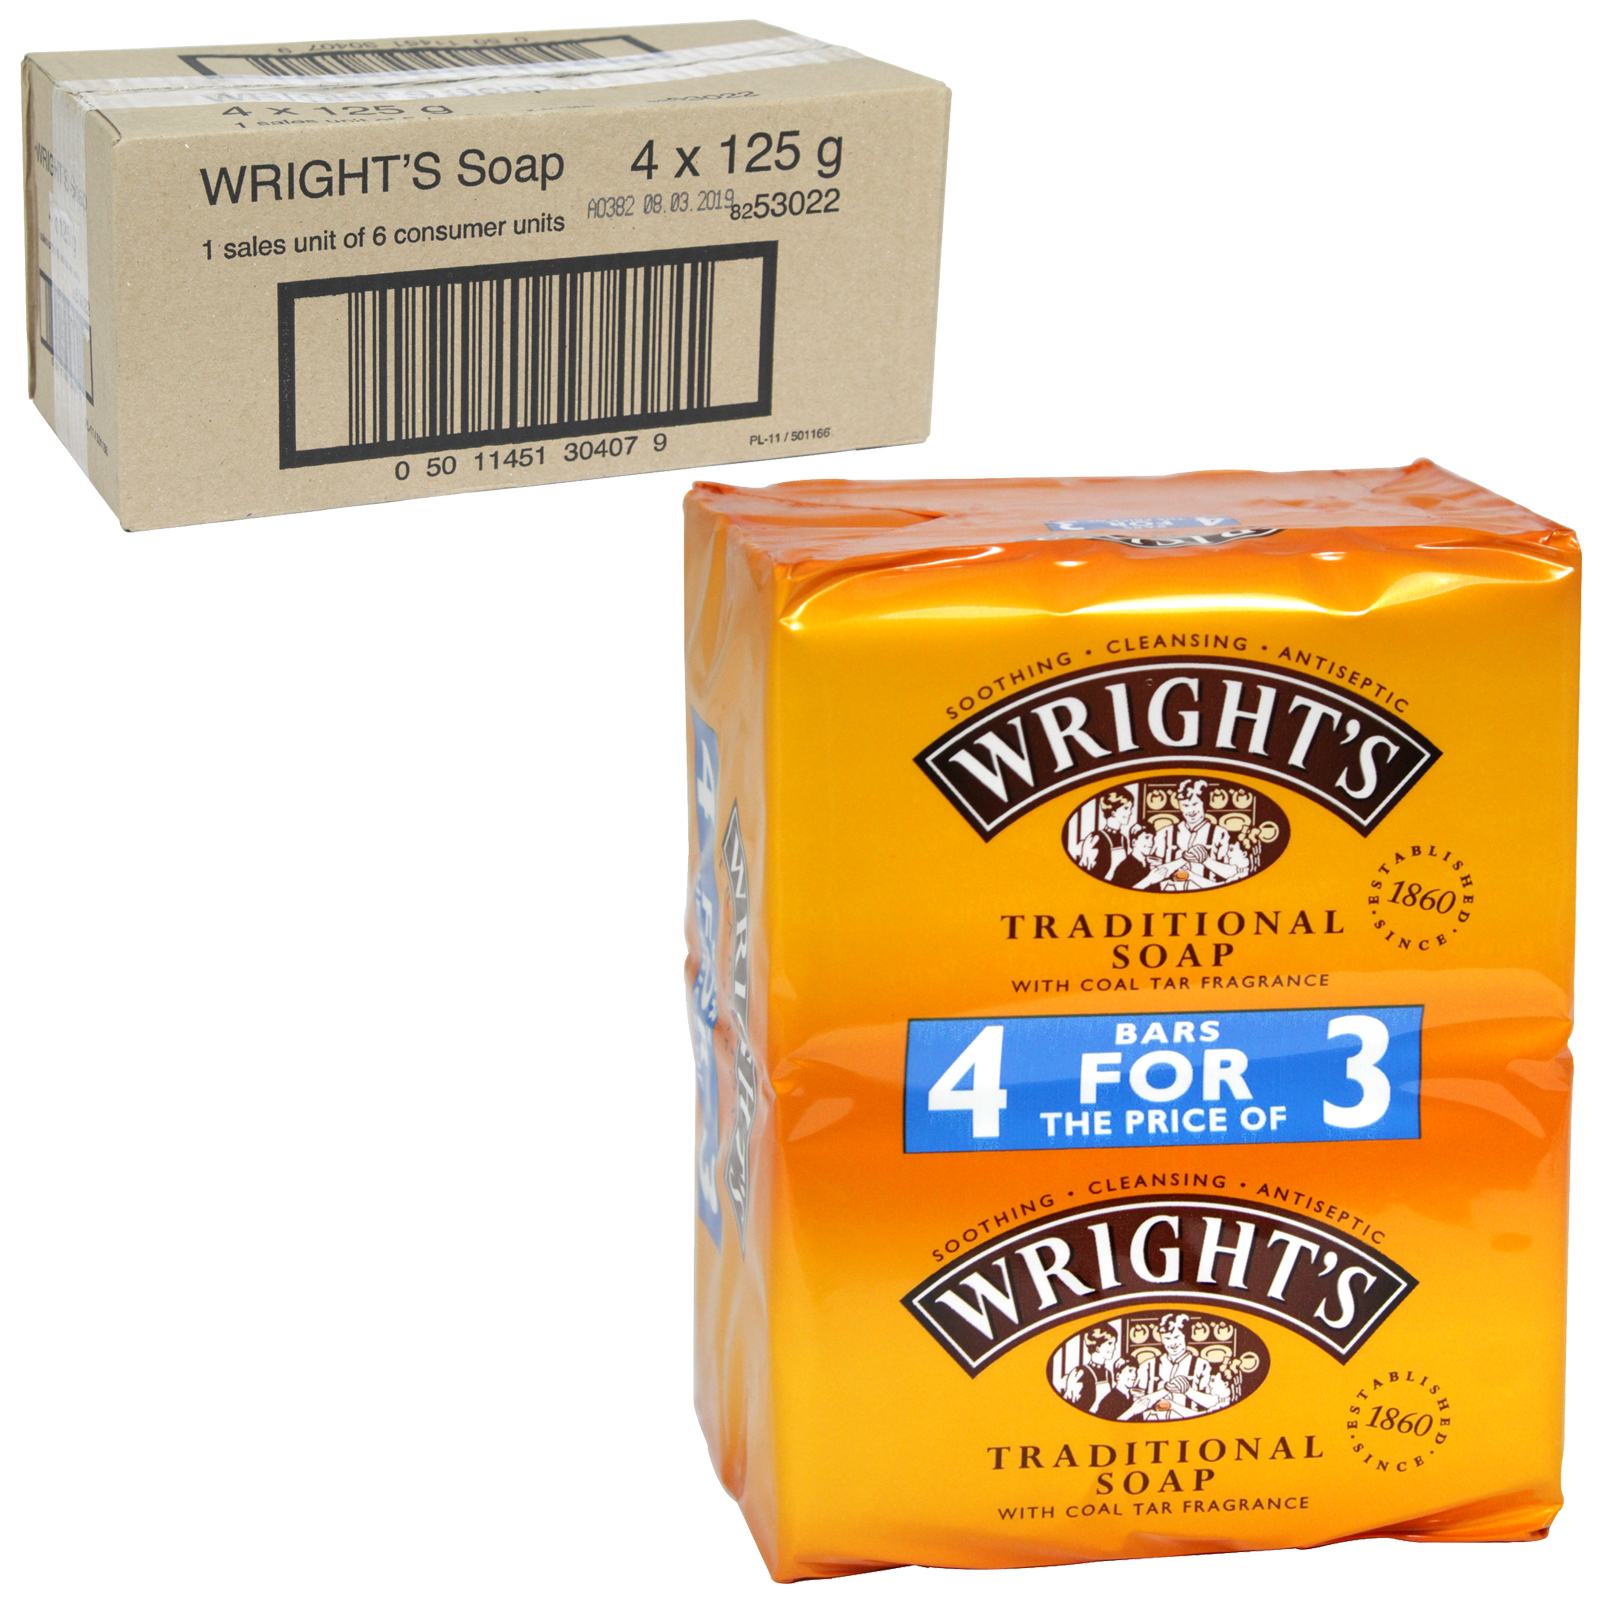 WRIGHTS COAL TAR SOAP 4X125G X6